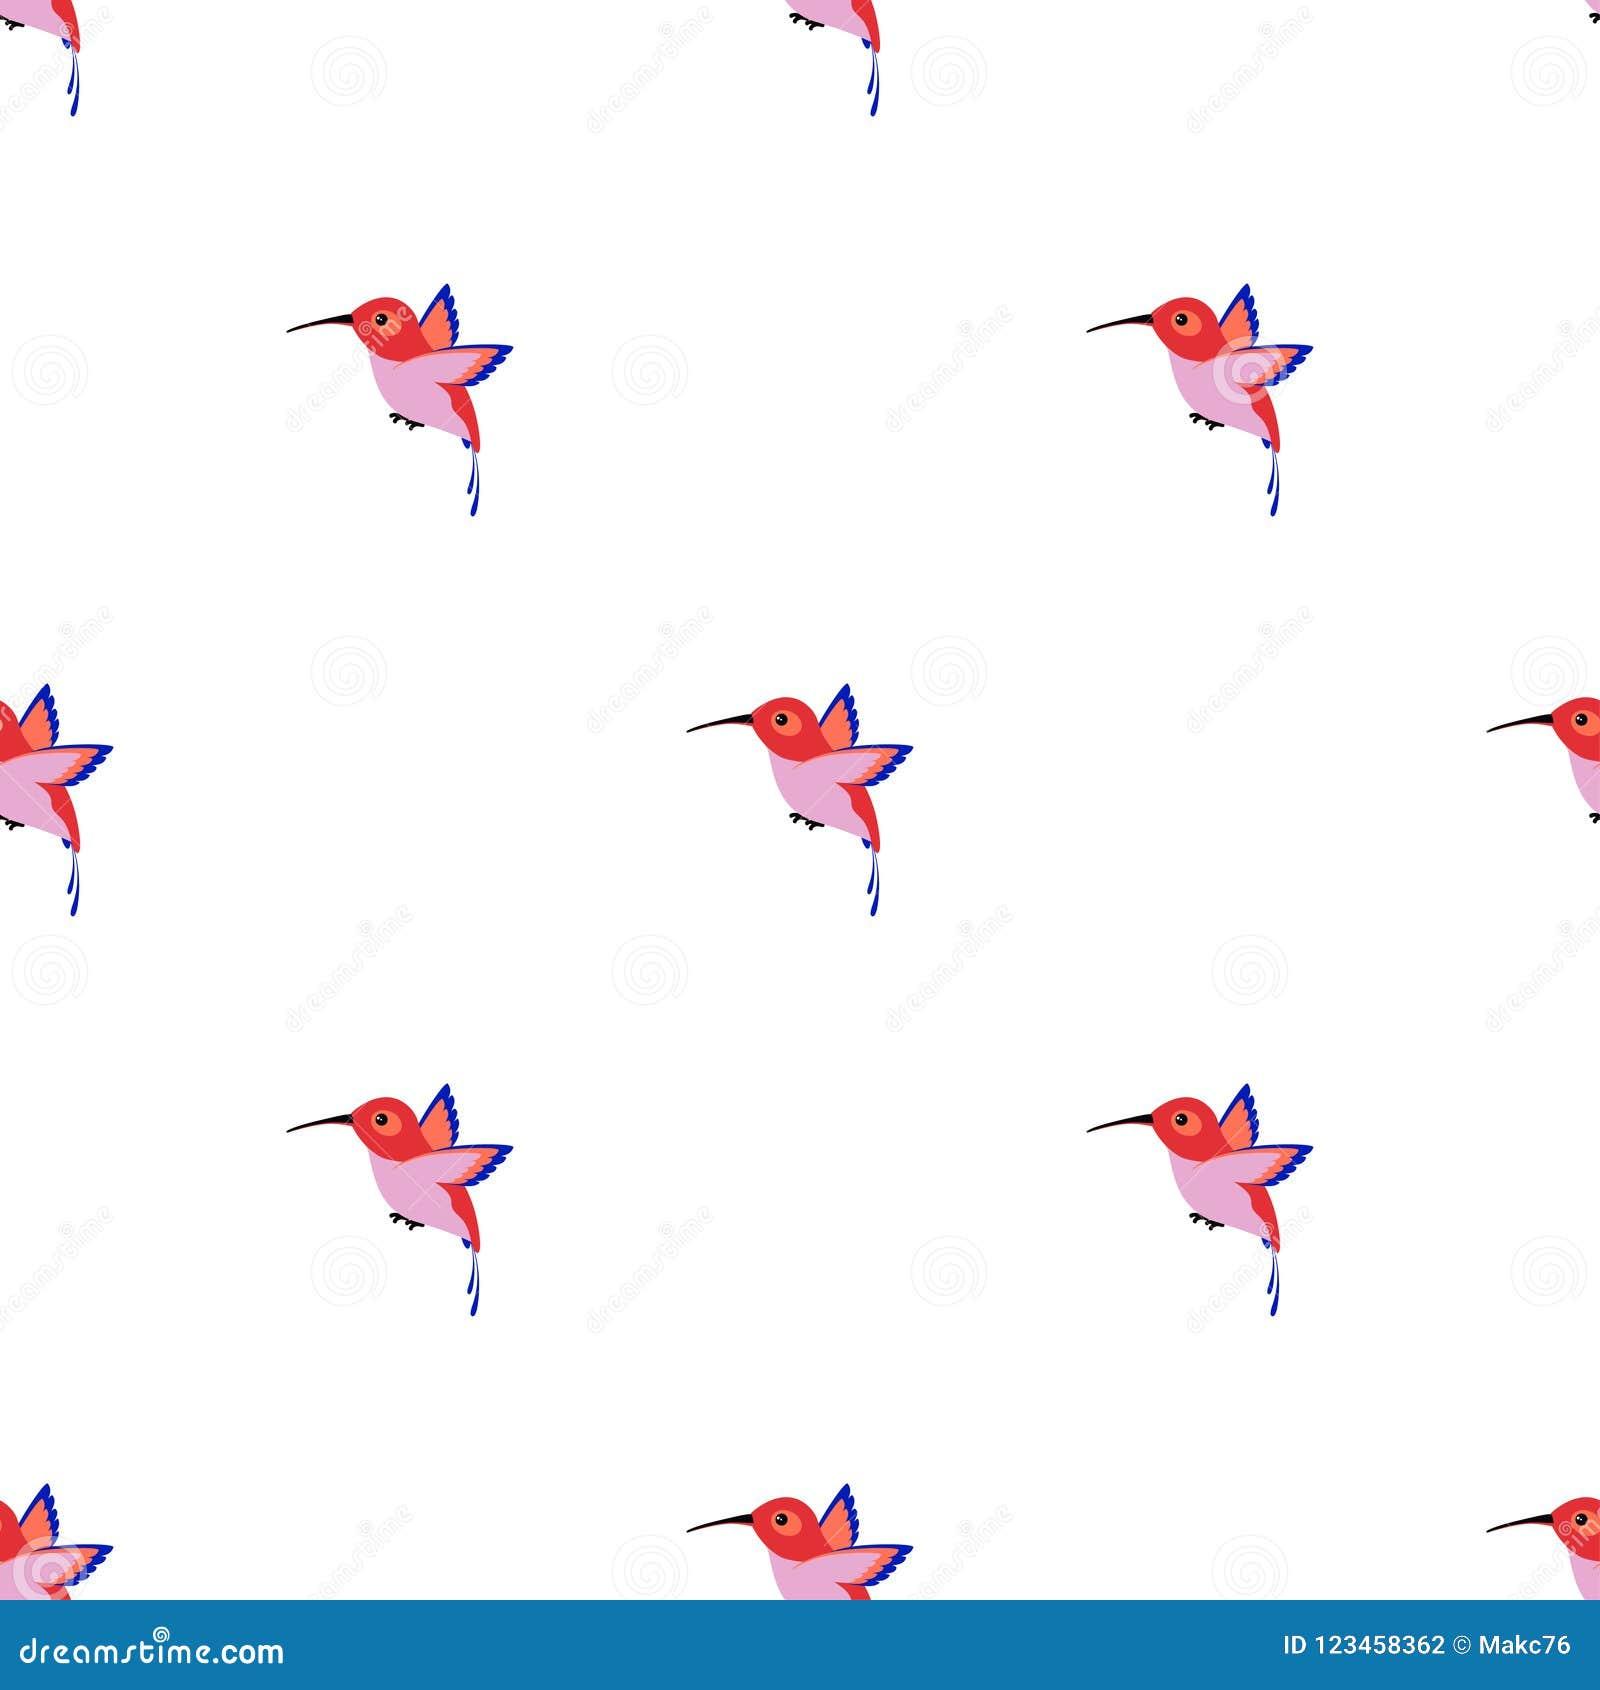 pattern with hummingbird stock vector illustration of flying